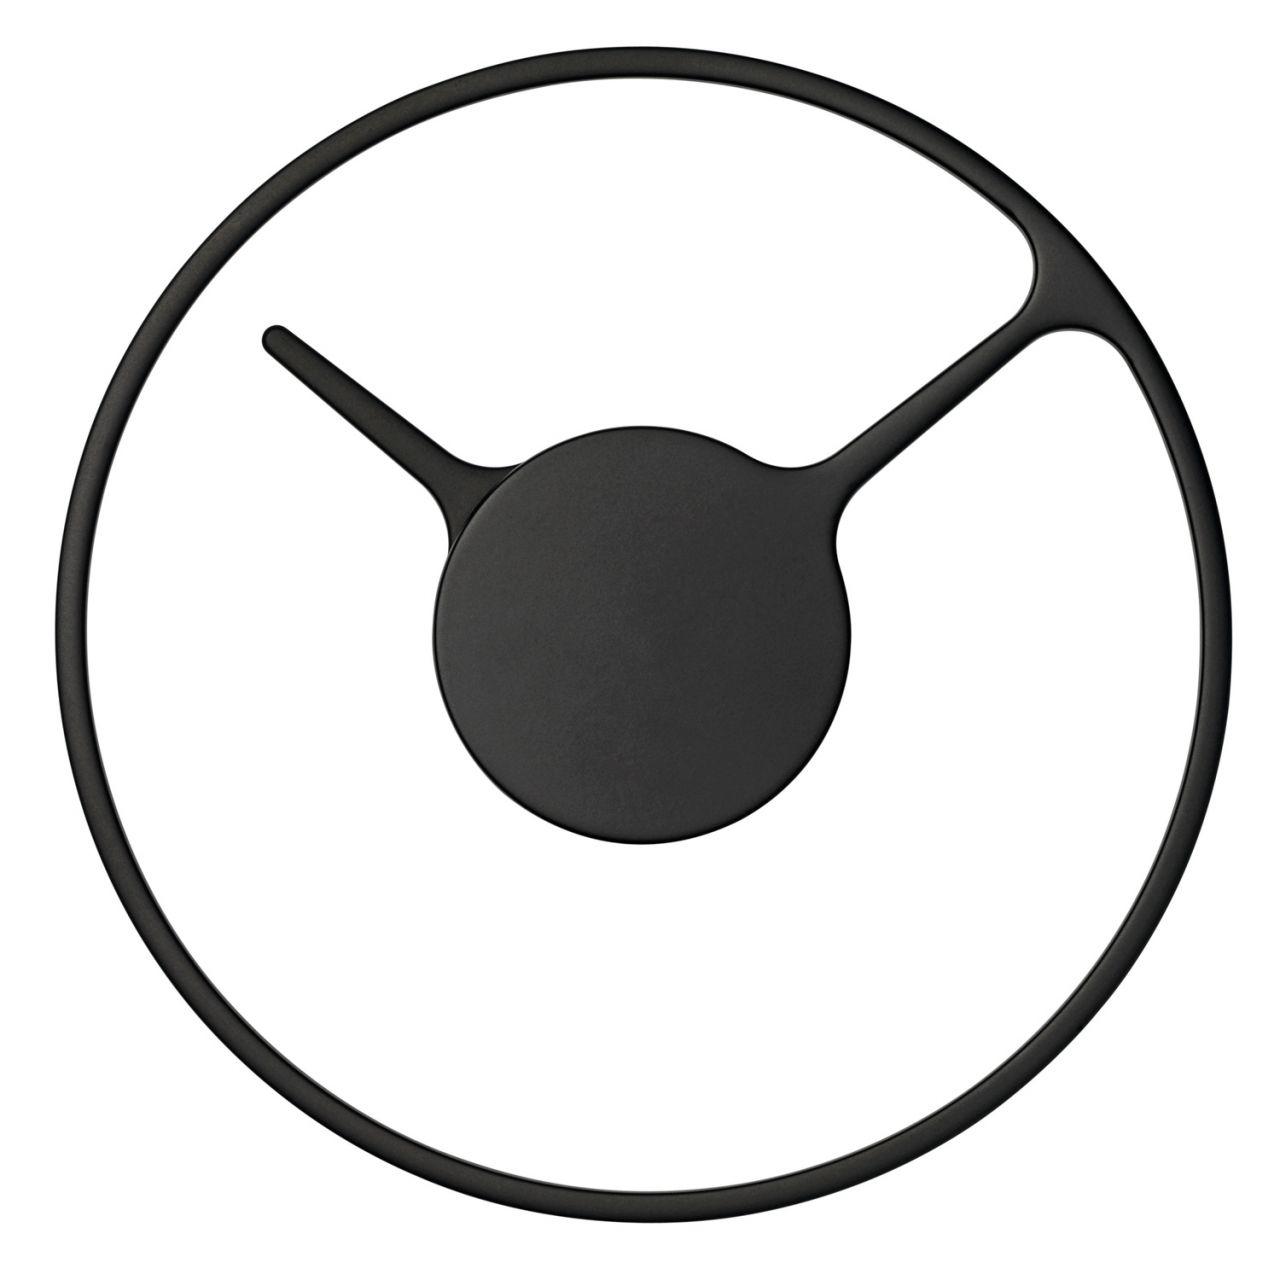 stelton - Time Wanduhr